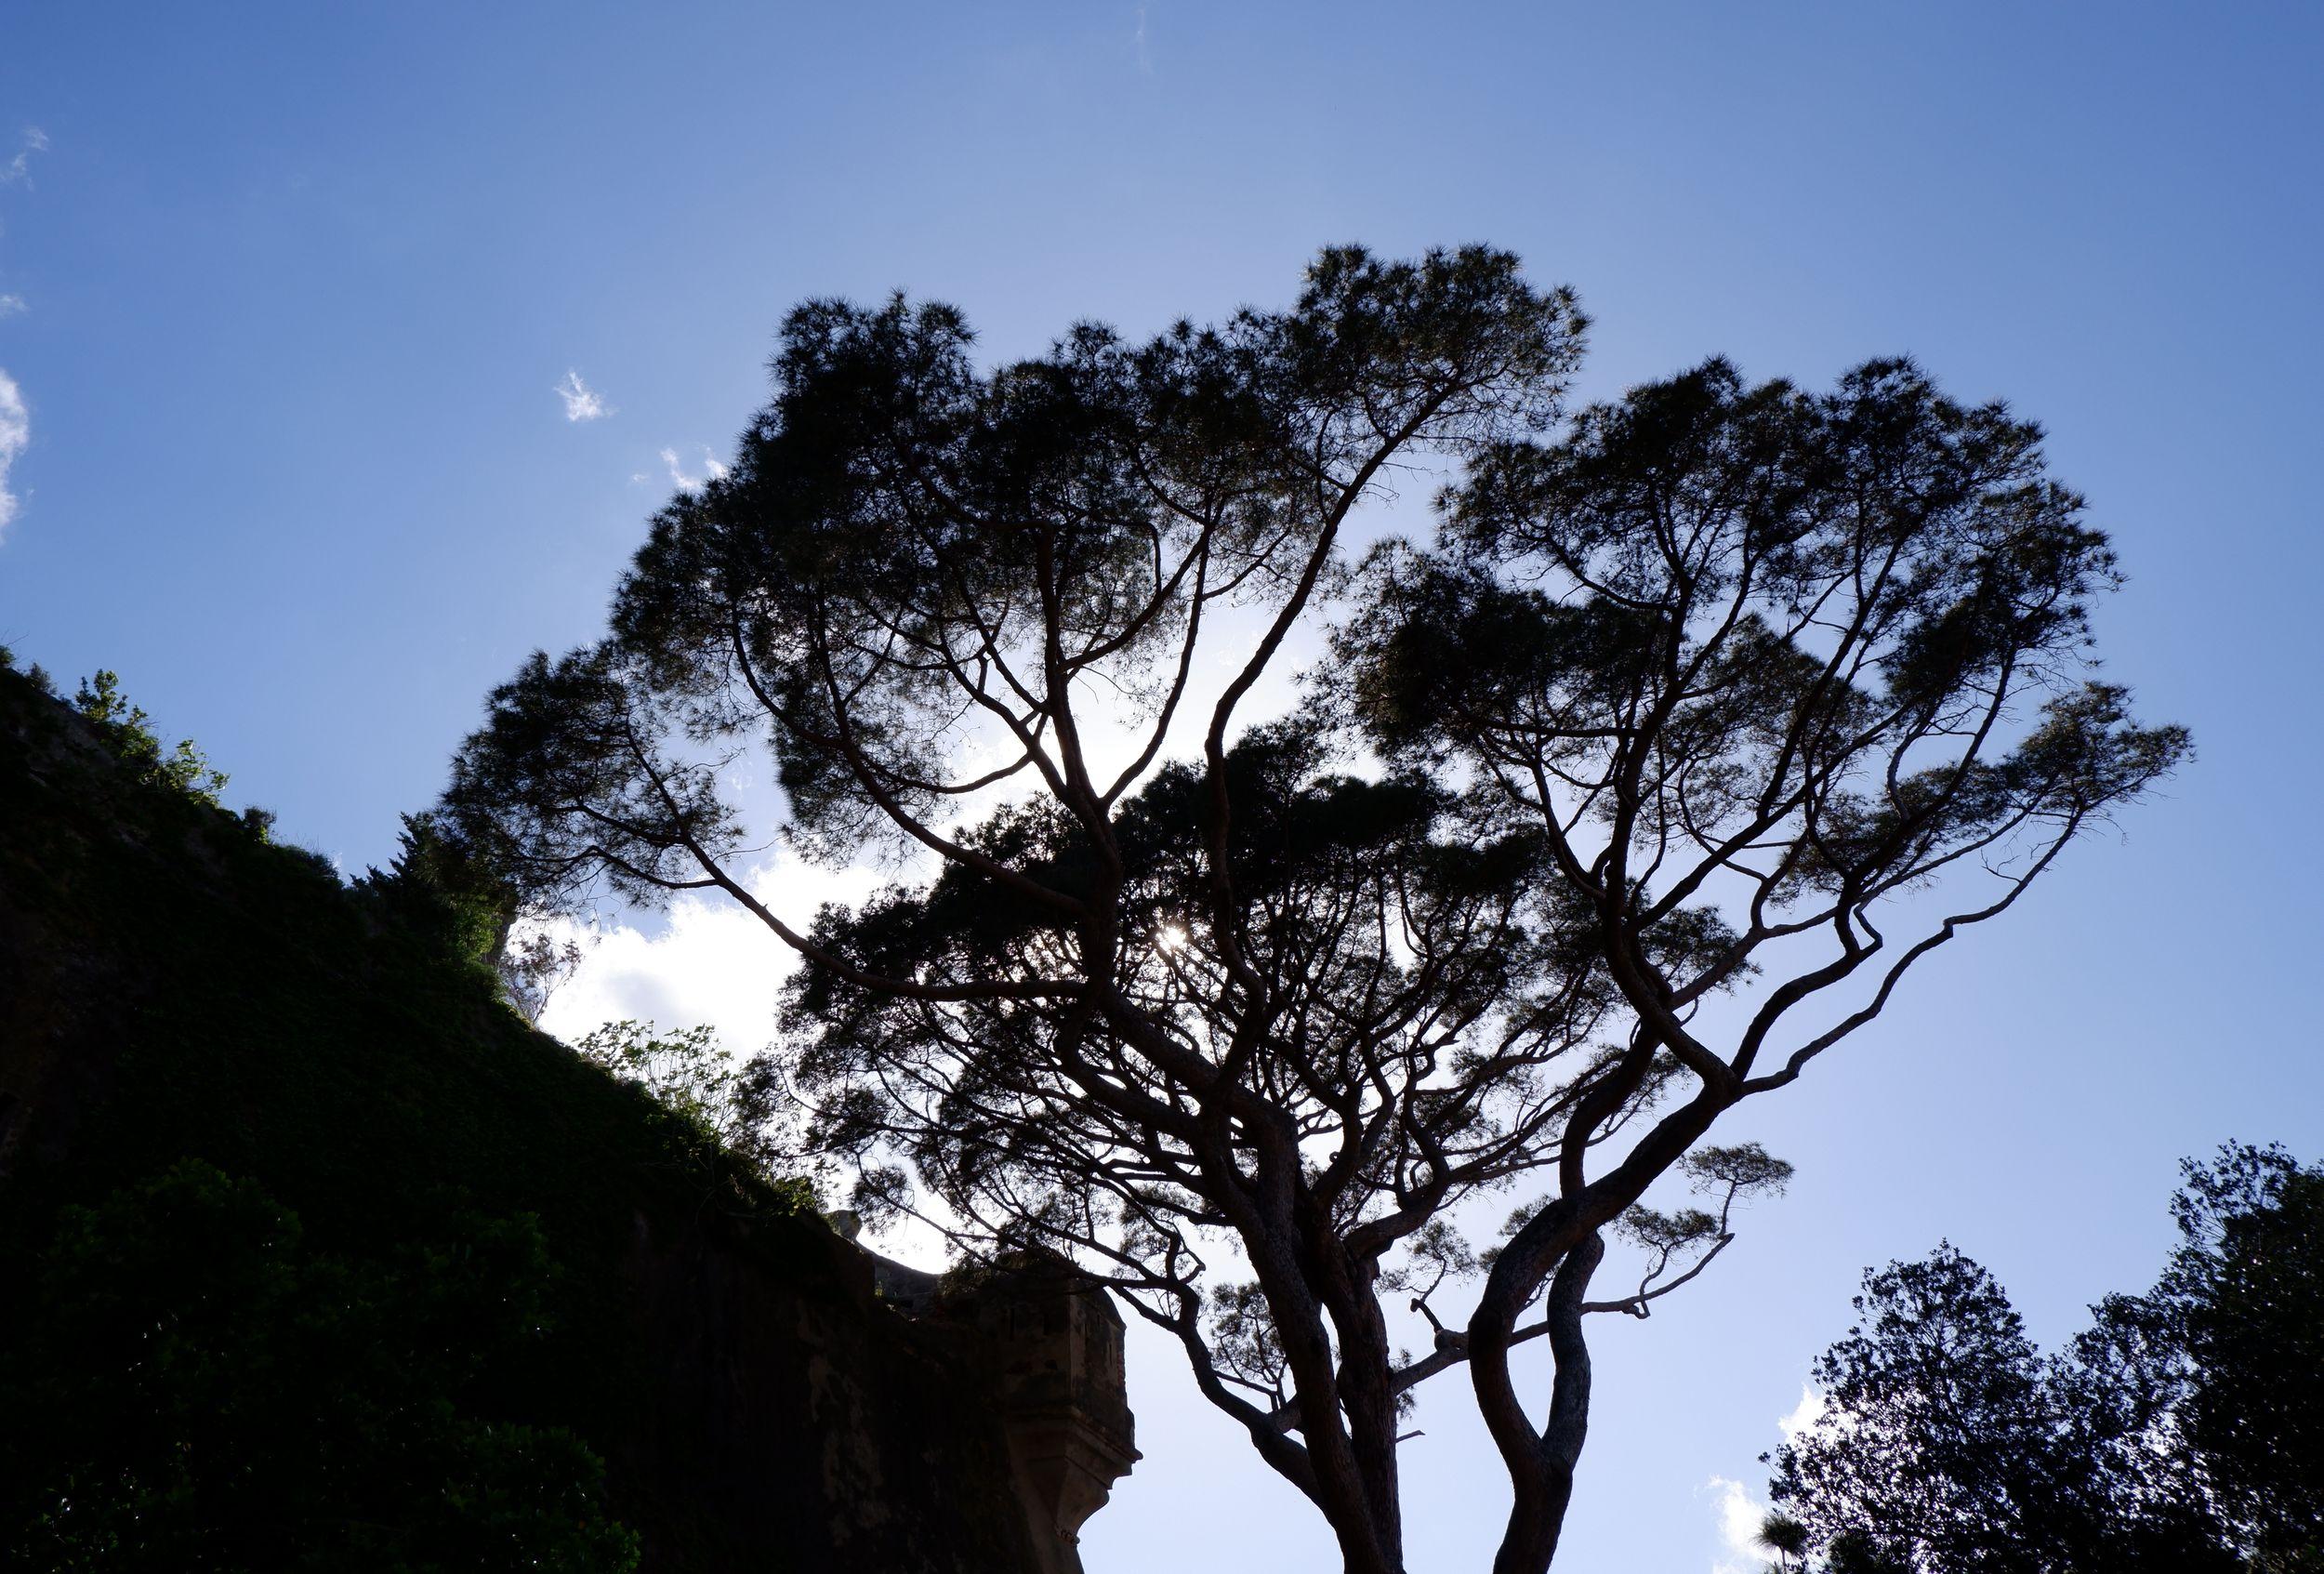 un pin vu en contre-jour